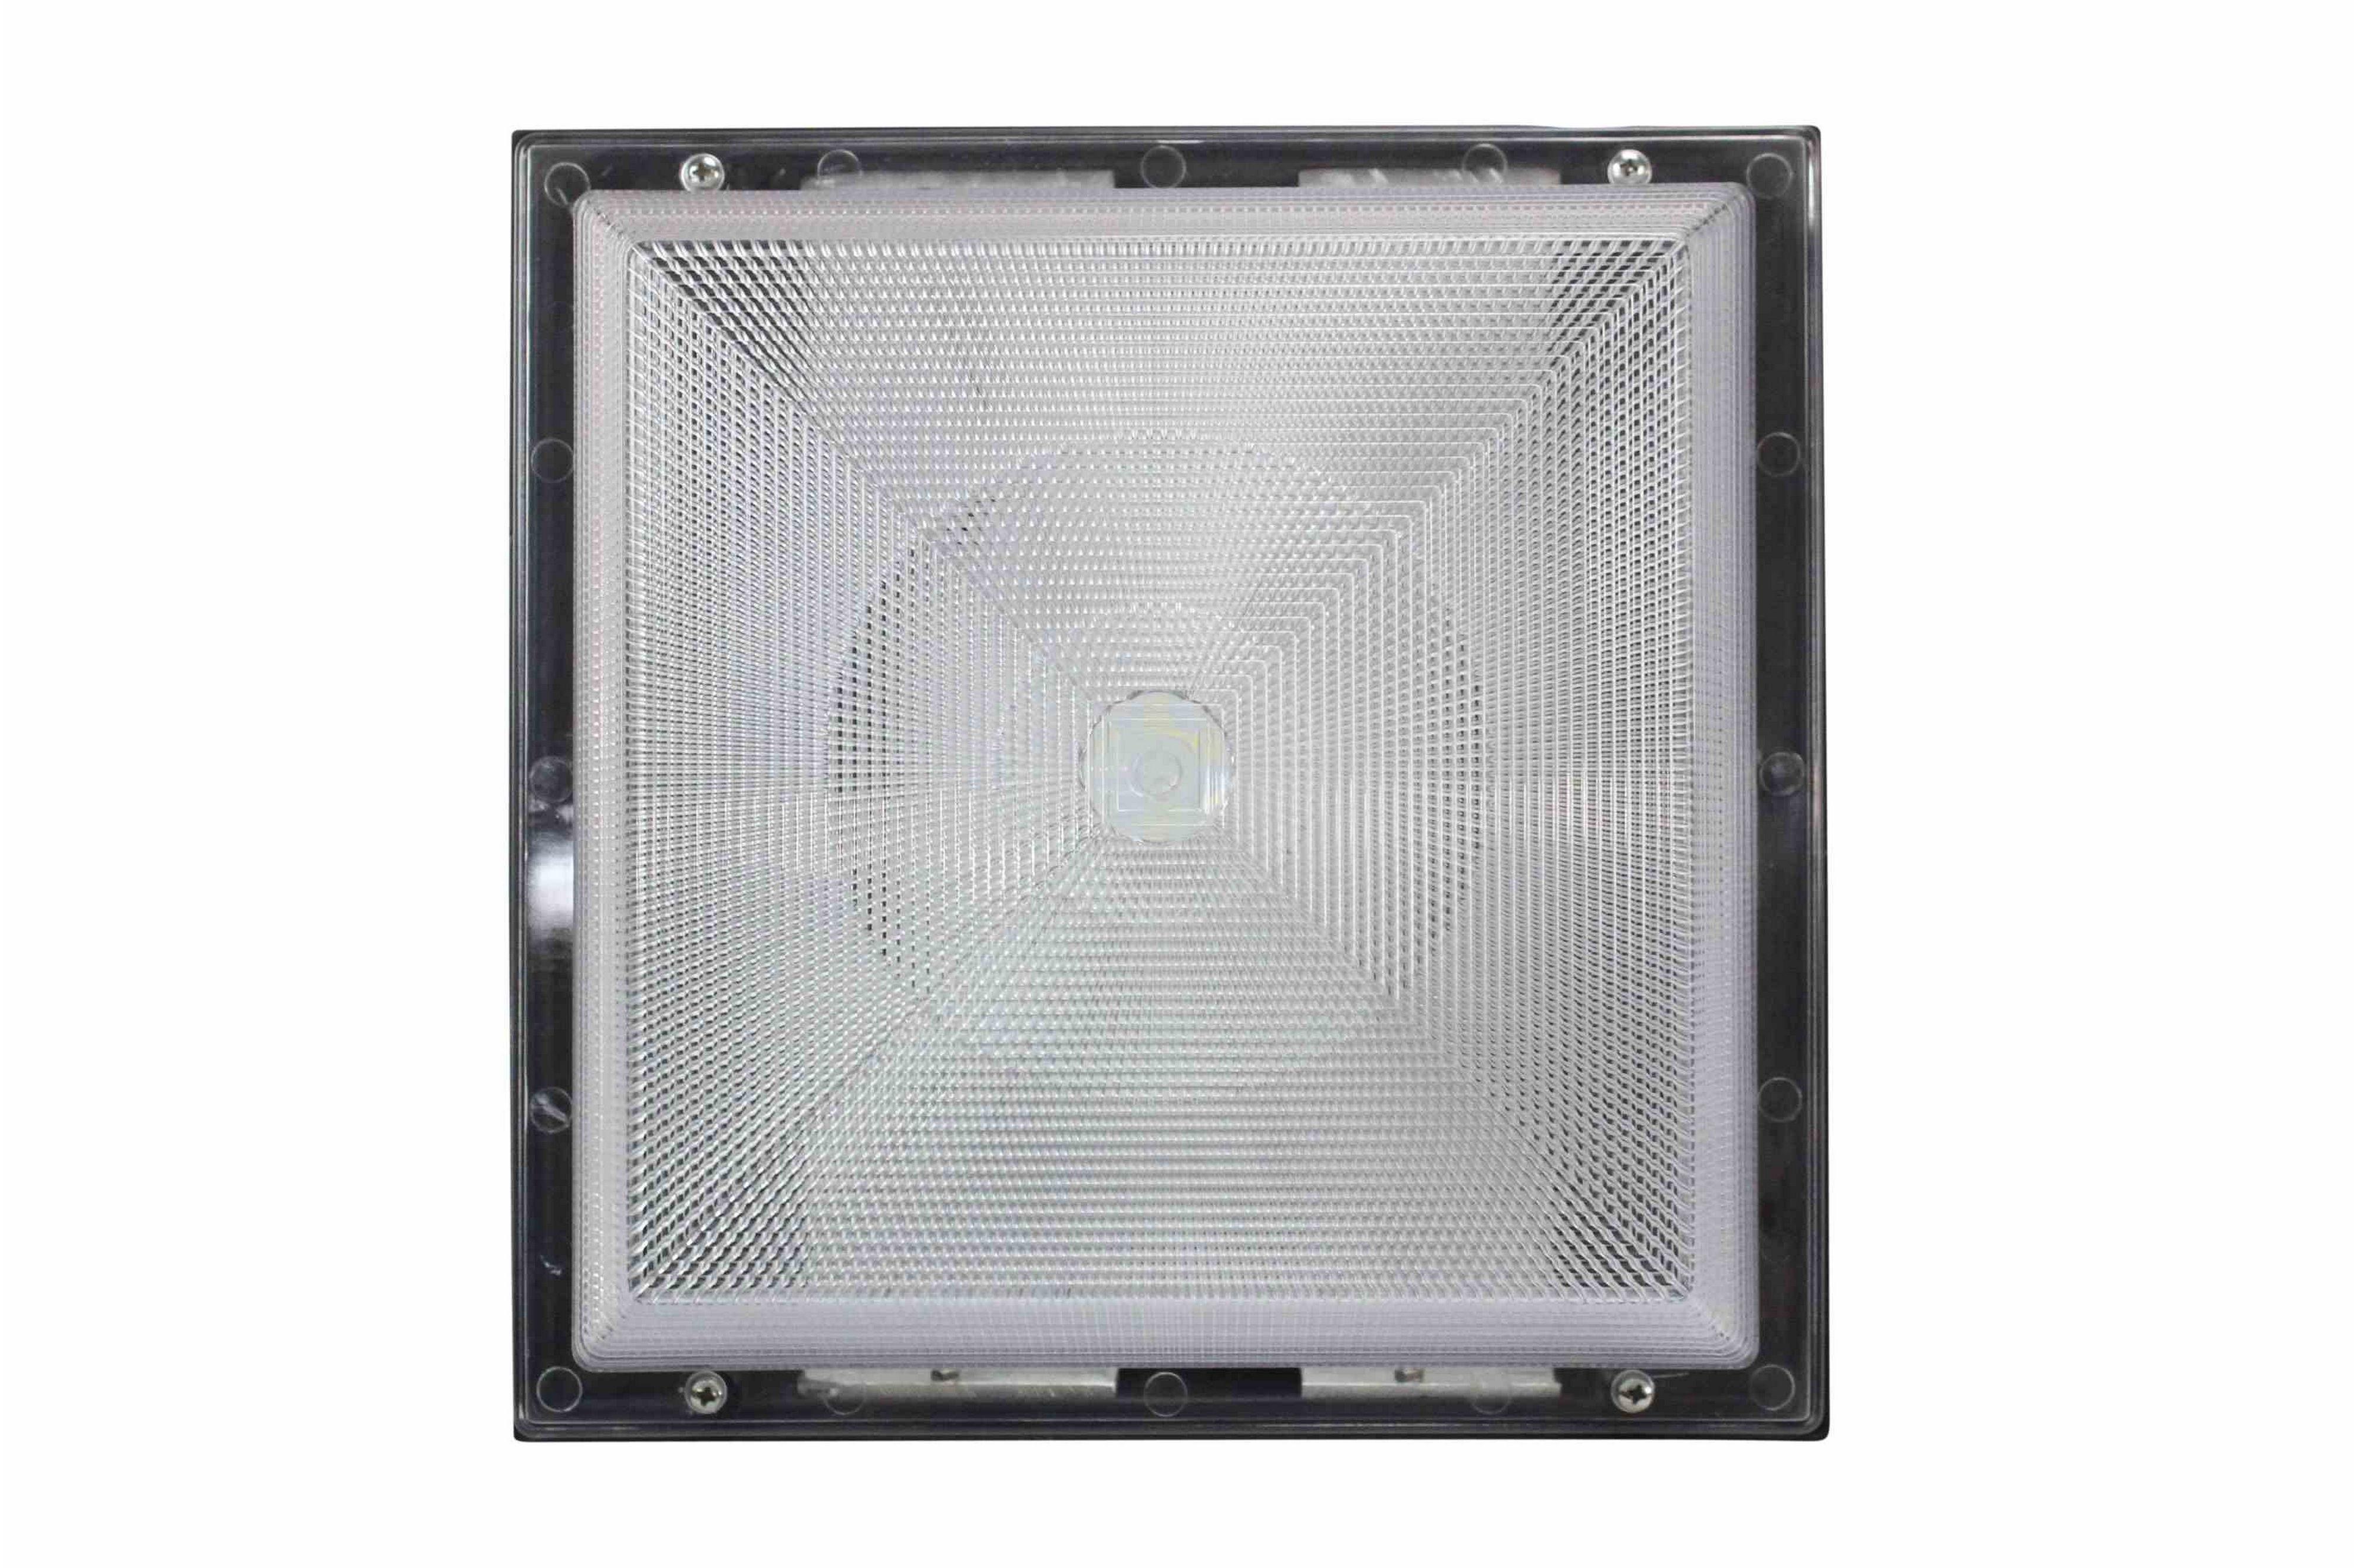 90 watt traditional led canopy light replaces 400 watt metal halide fixtures 120 277v ac. Black Bedroom Furniture Sets. Home Design Ideas